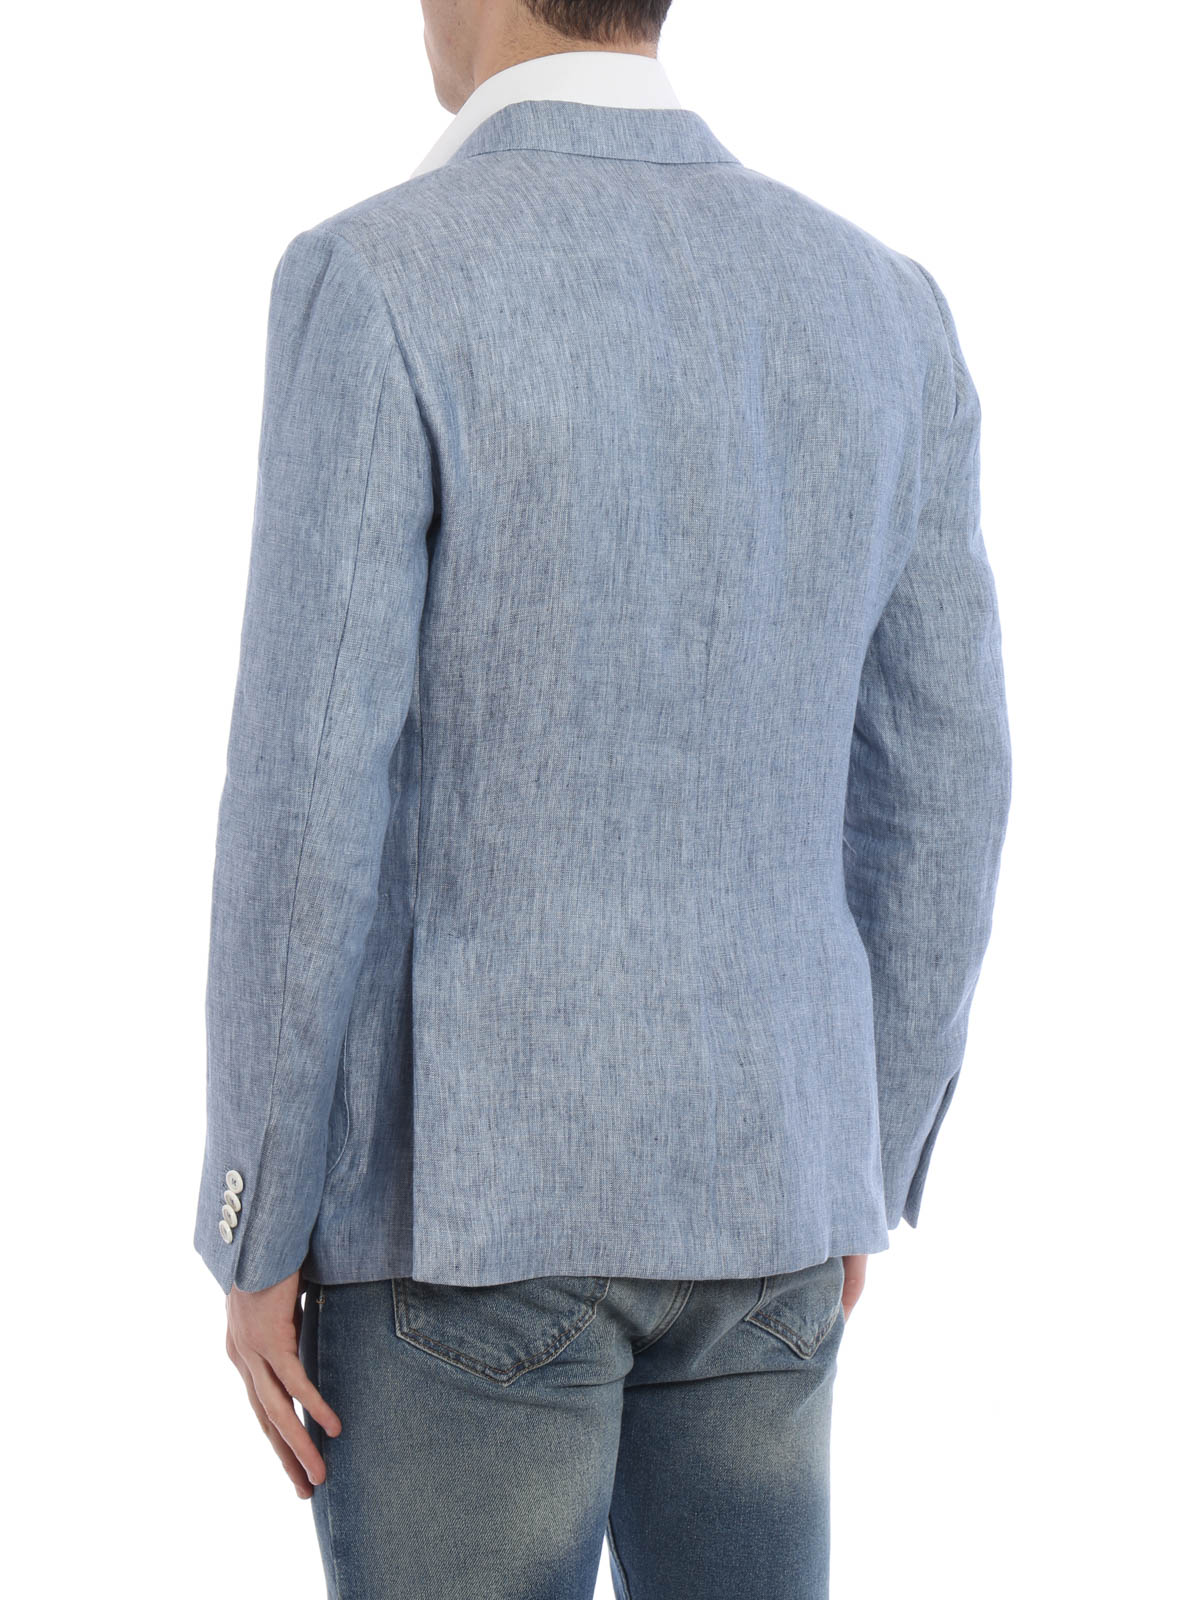 94fb4243 Z Zegna - Linen blend unstructured blazer - blazers - 973717 1DNMG0 SKY